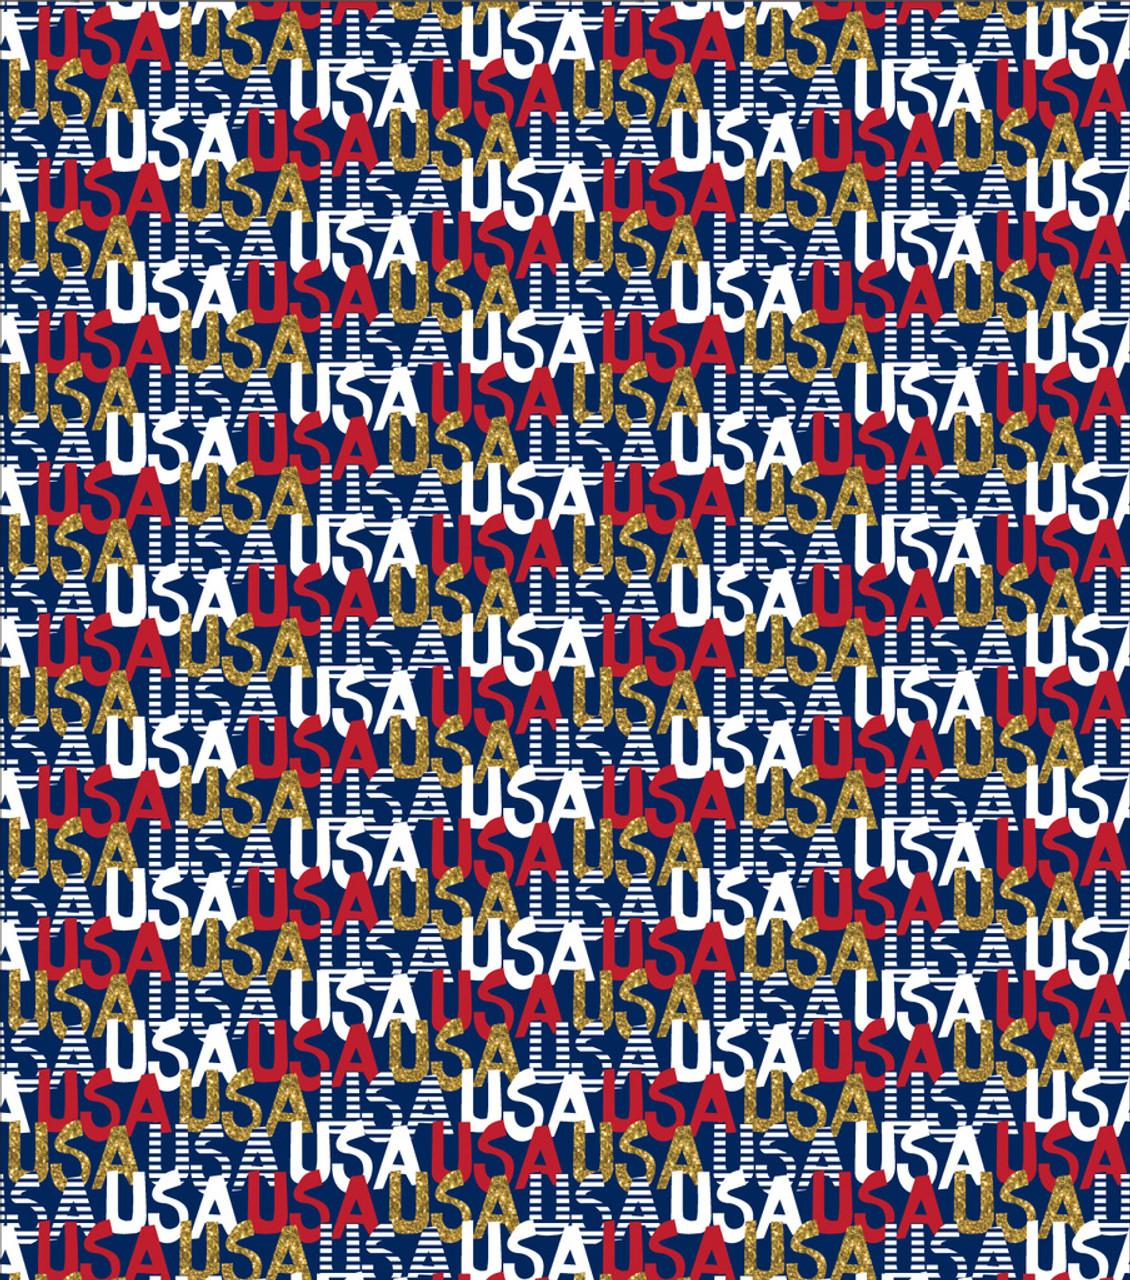 USA Gold Glitter